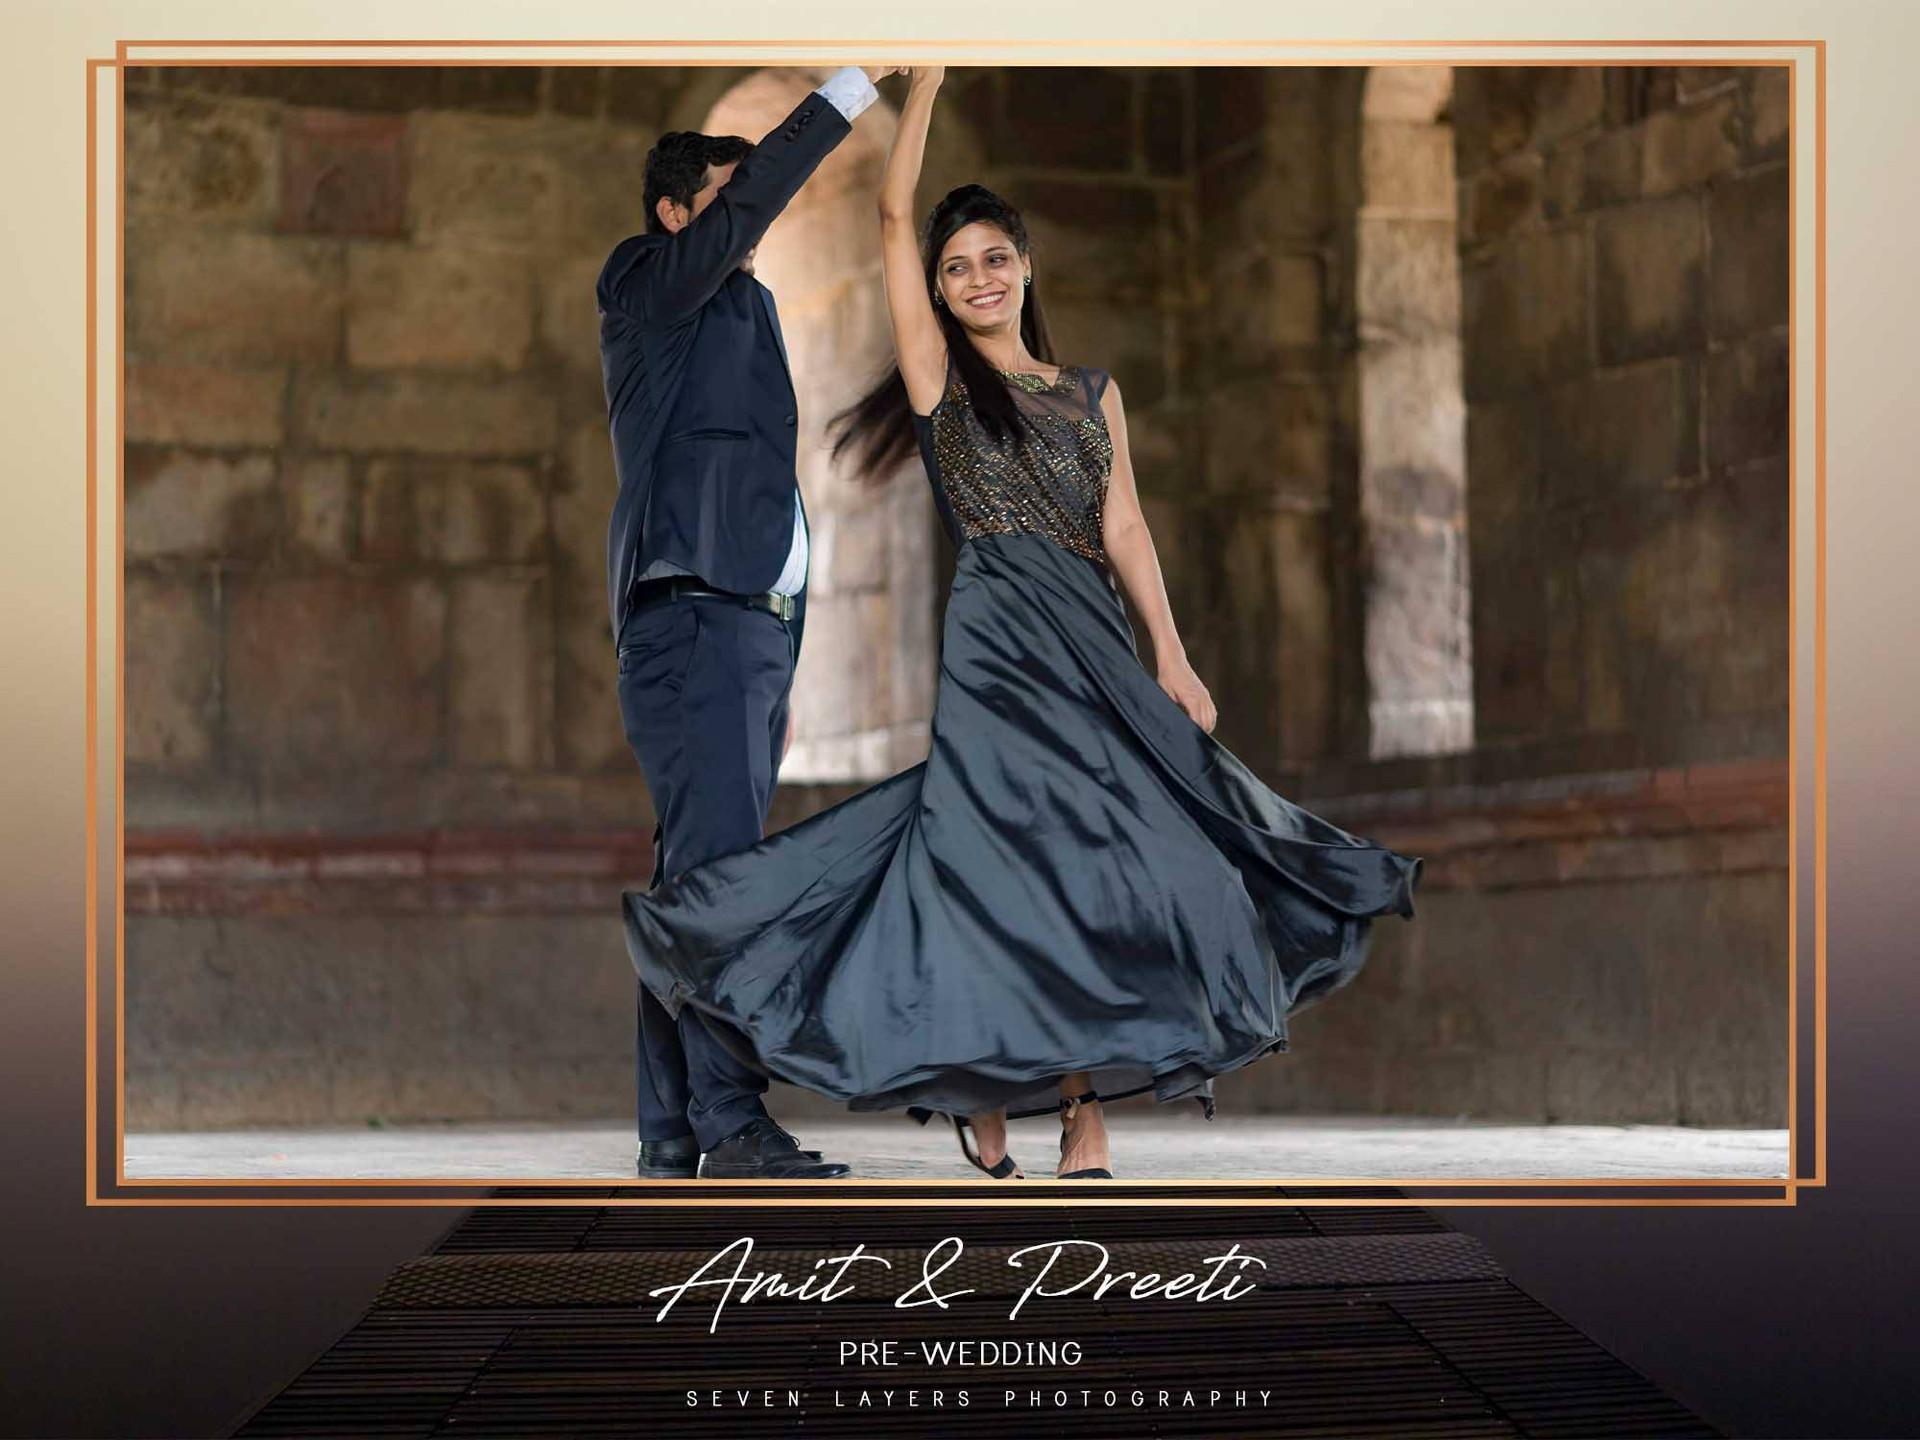 Amit and Preeti Pre-Wedding_Seven layers Photography (4)